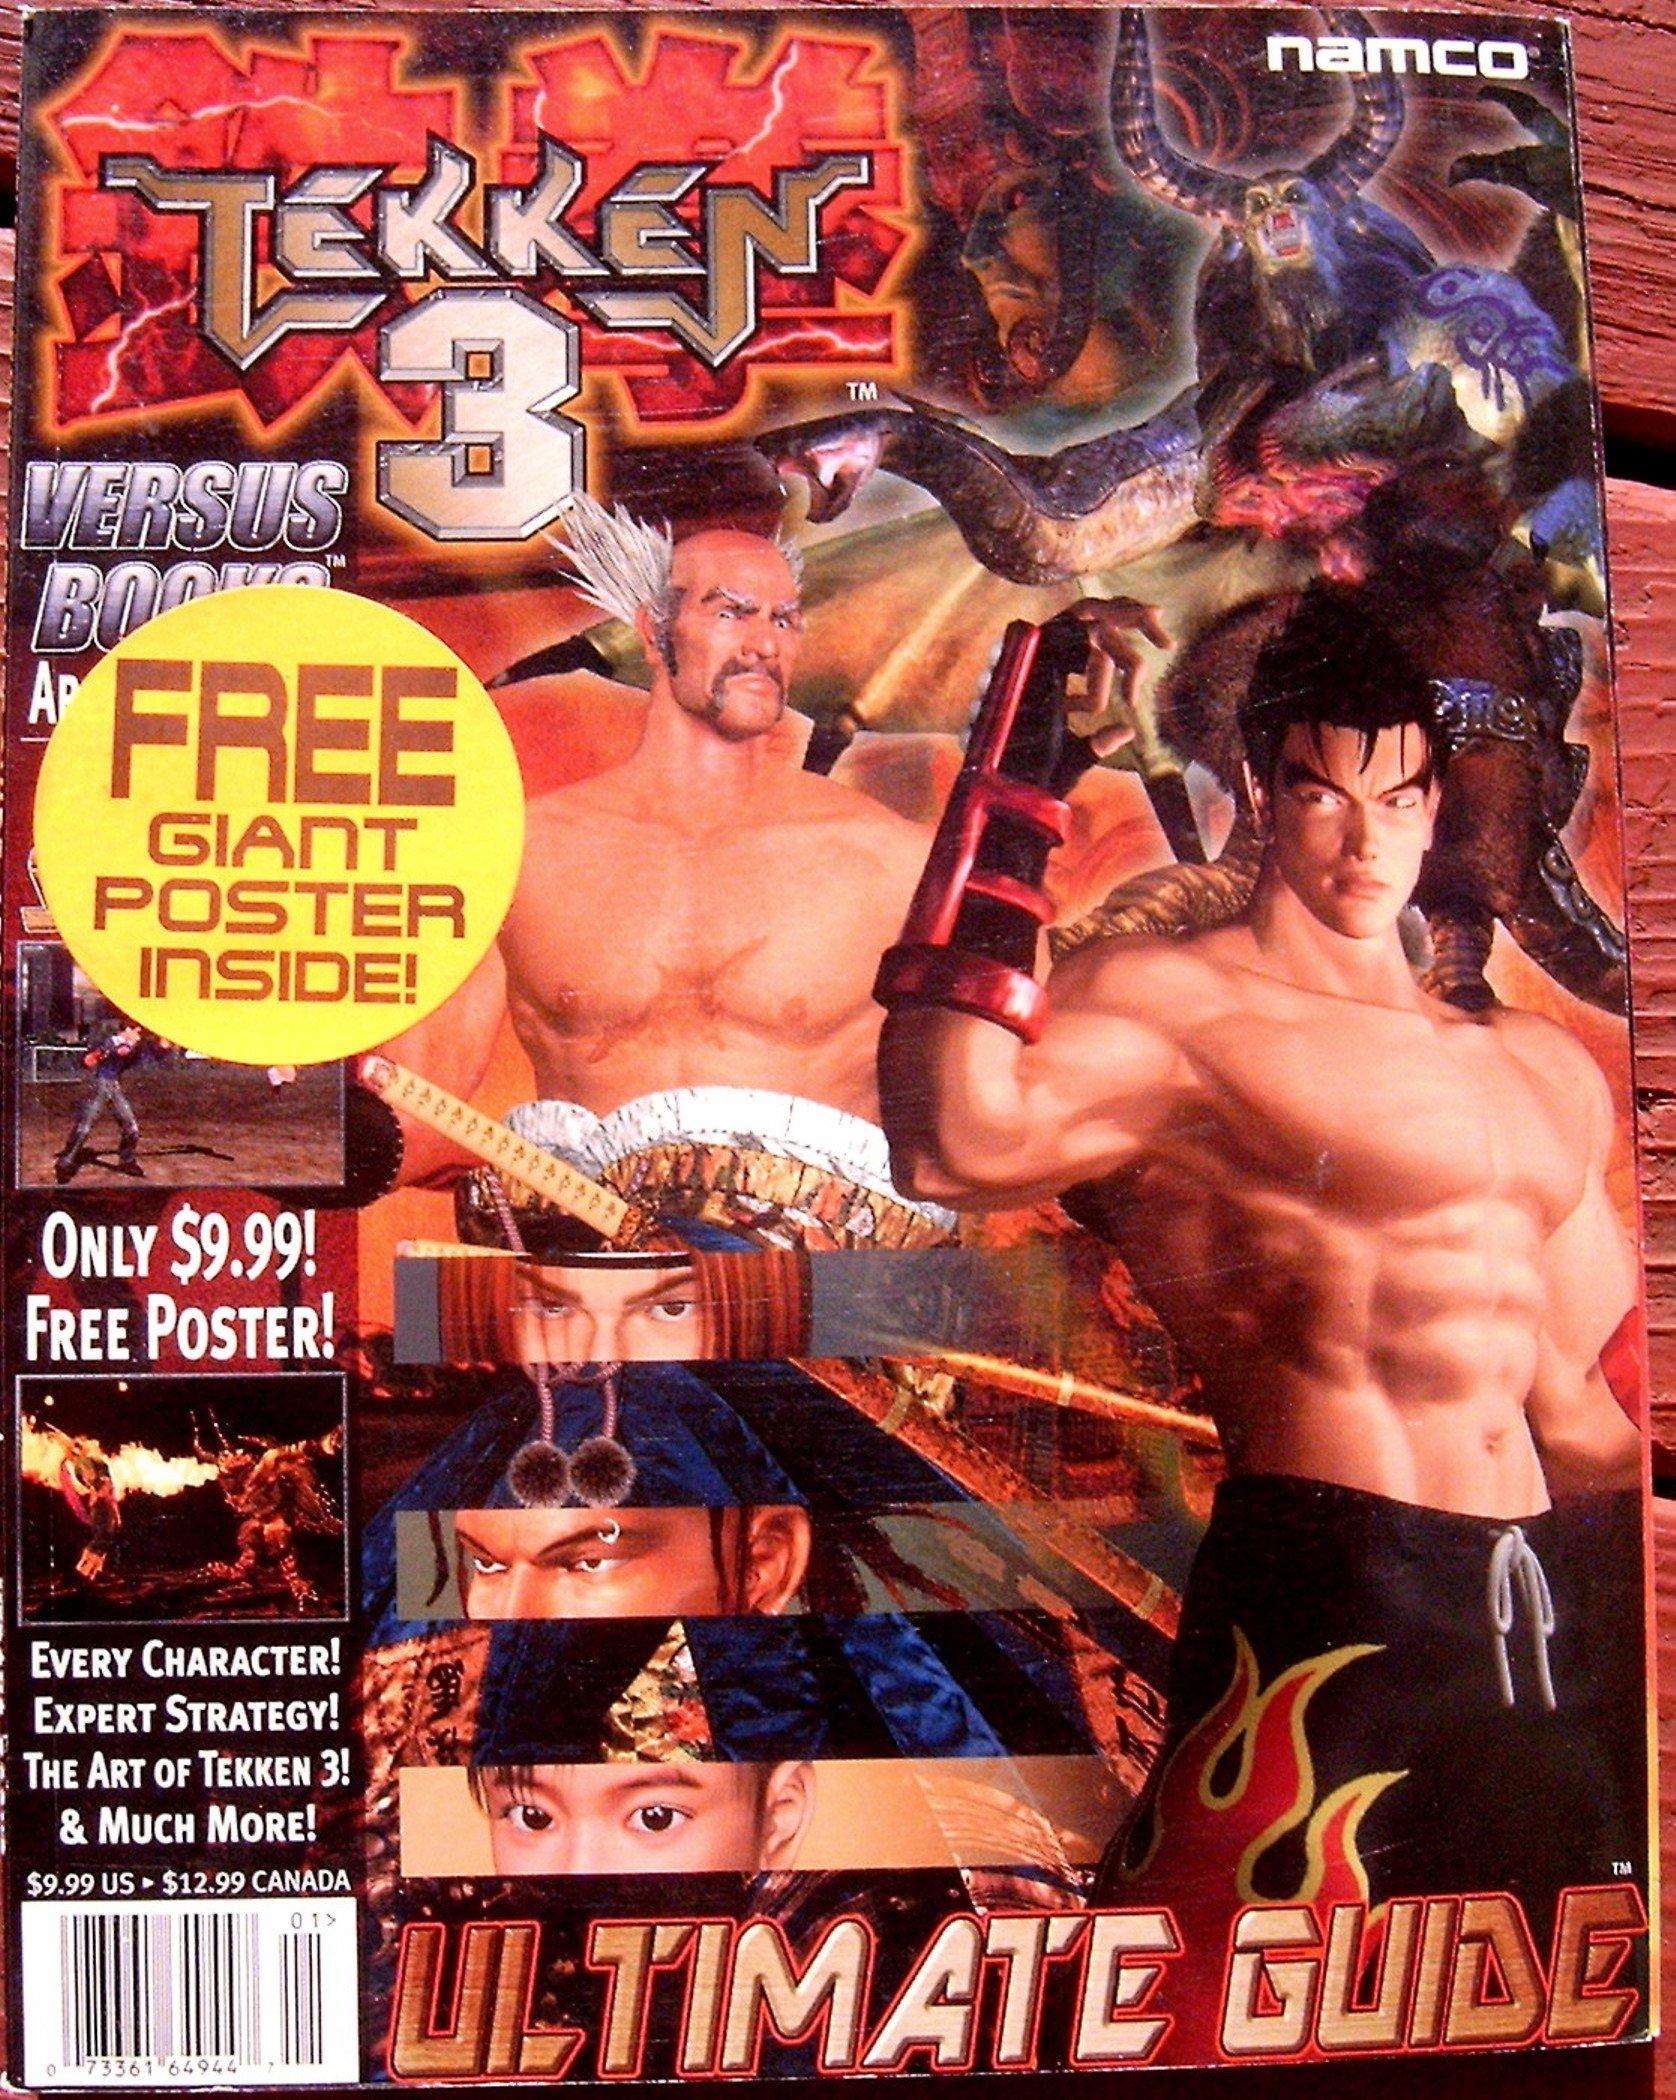 TEKKEN 3: The Ultimate Tekken 3 Guide